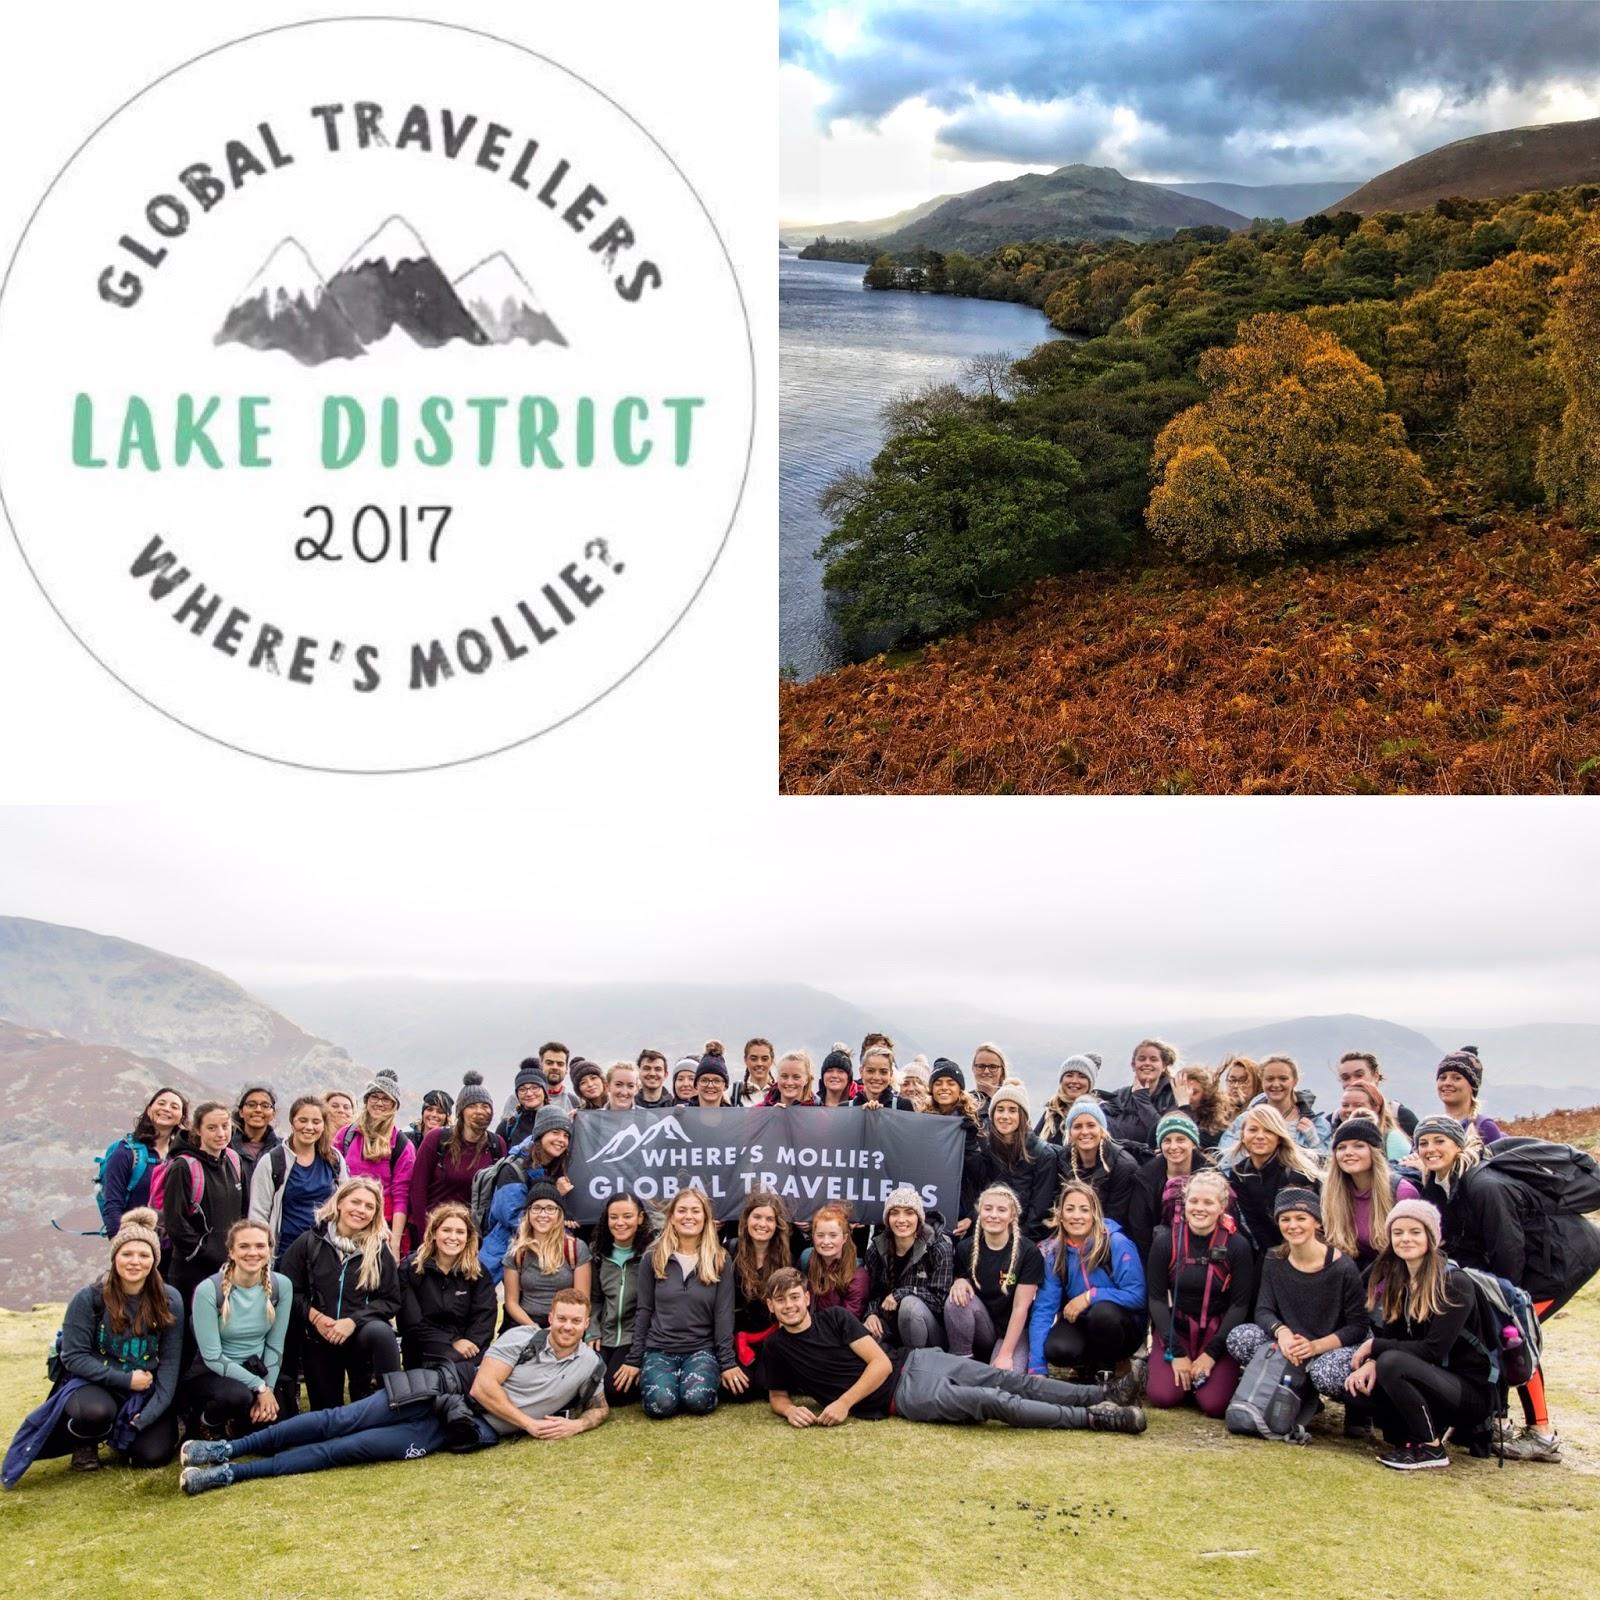 #WMGT, #WMGlobalTravellers, #LakeDistrict, #Ullswater, #Windermere, #Ambleside, #BritishCountryside, #theLifeofaSocialButterfly, #WheresMollie, #tblogger, #TravelBlogger, #GroupTravel, #Adventure, #Weekend, #SoloTravel, #travel, #VisitEngland, #England, #Cumbria, #Scenic, #GreatBritain, #YHA, #Hostel, #YHAAmbleside, #nature, #MollieBylett